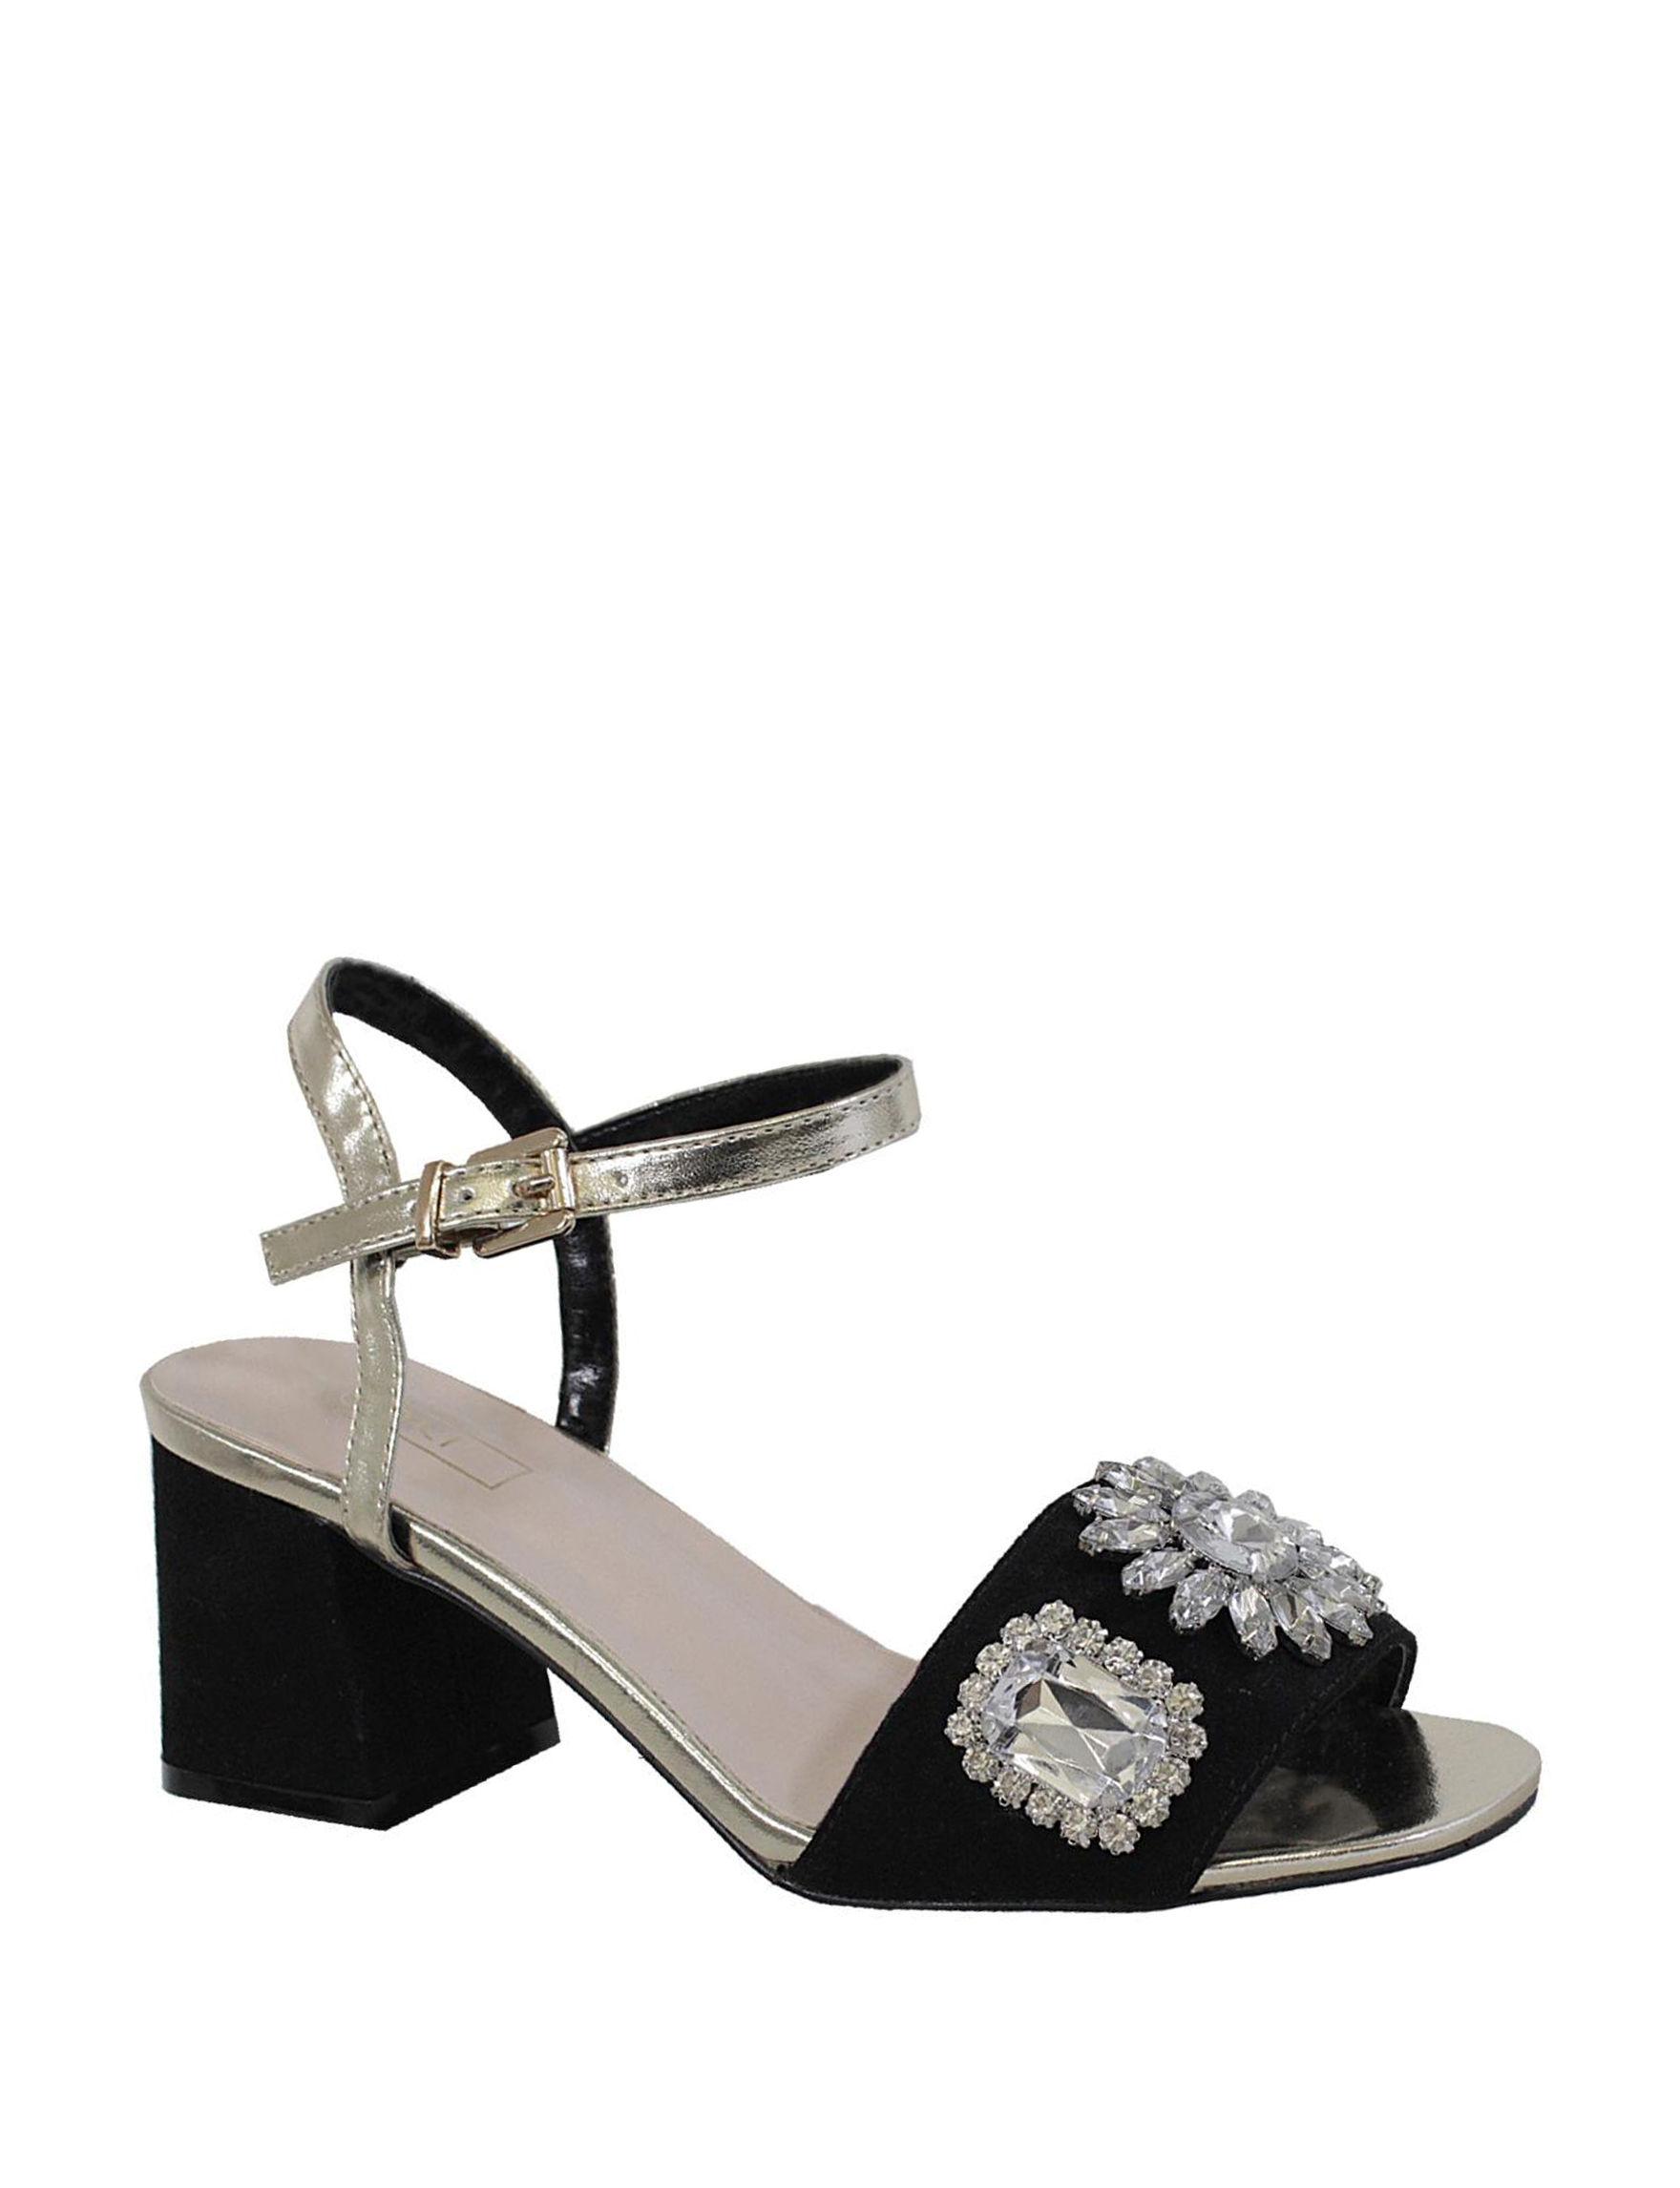 Yoki Black Heeled Sandals